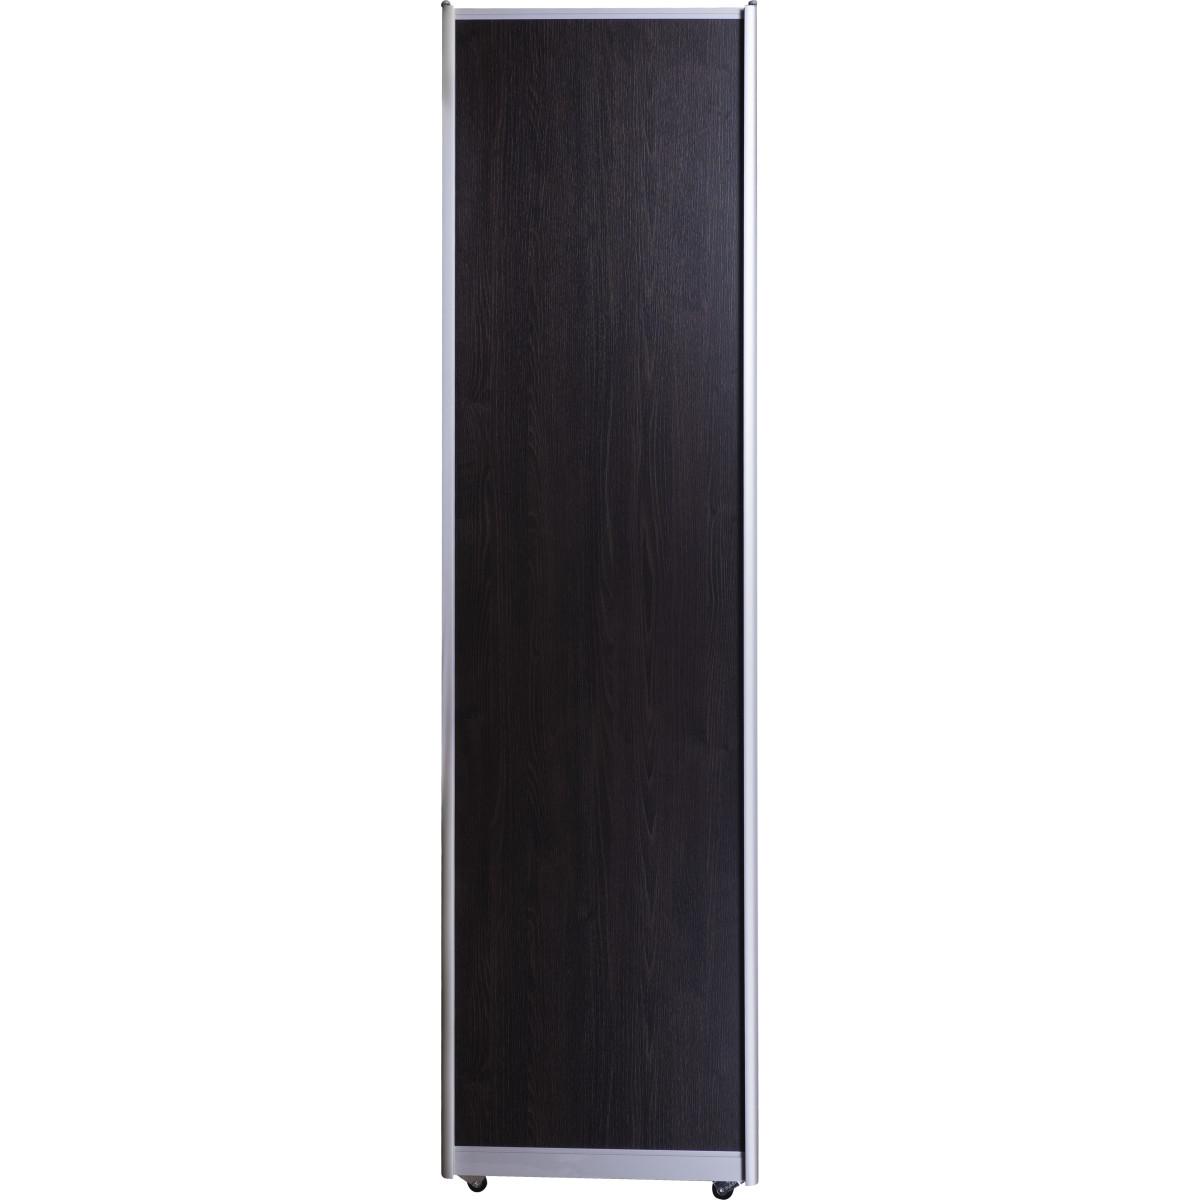 Дверь-купе Spaceo 2255x904 мм ЛДСП цвет дуб термо тёмный